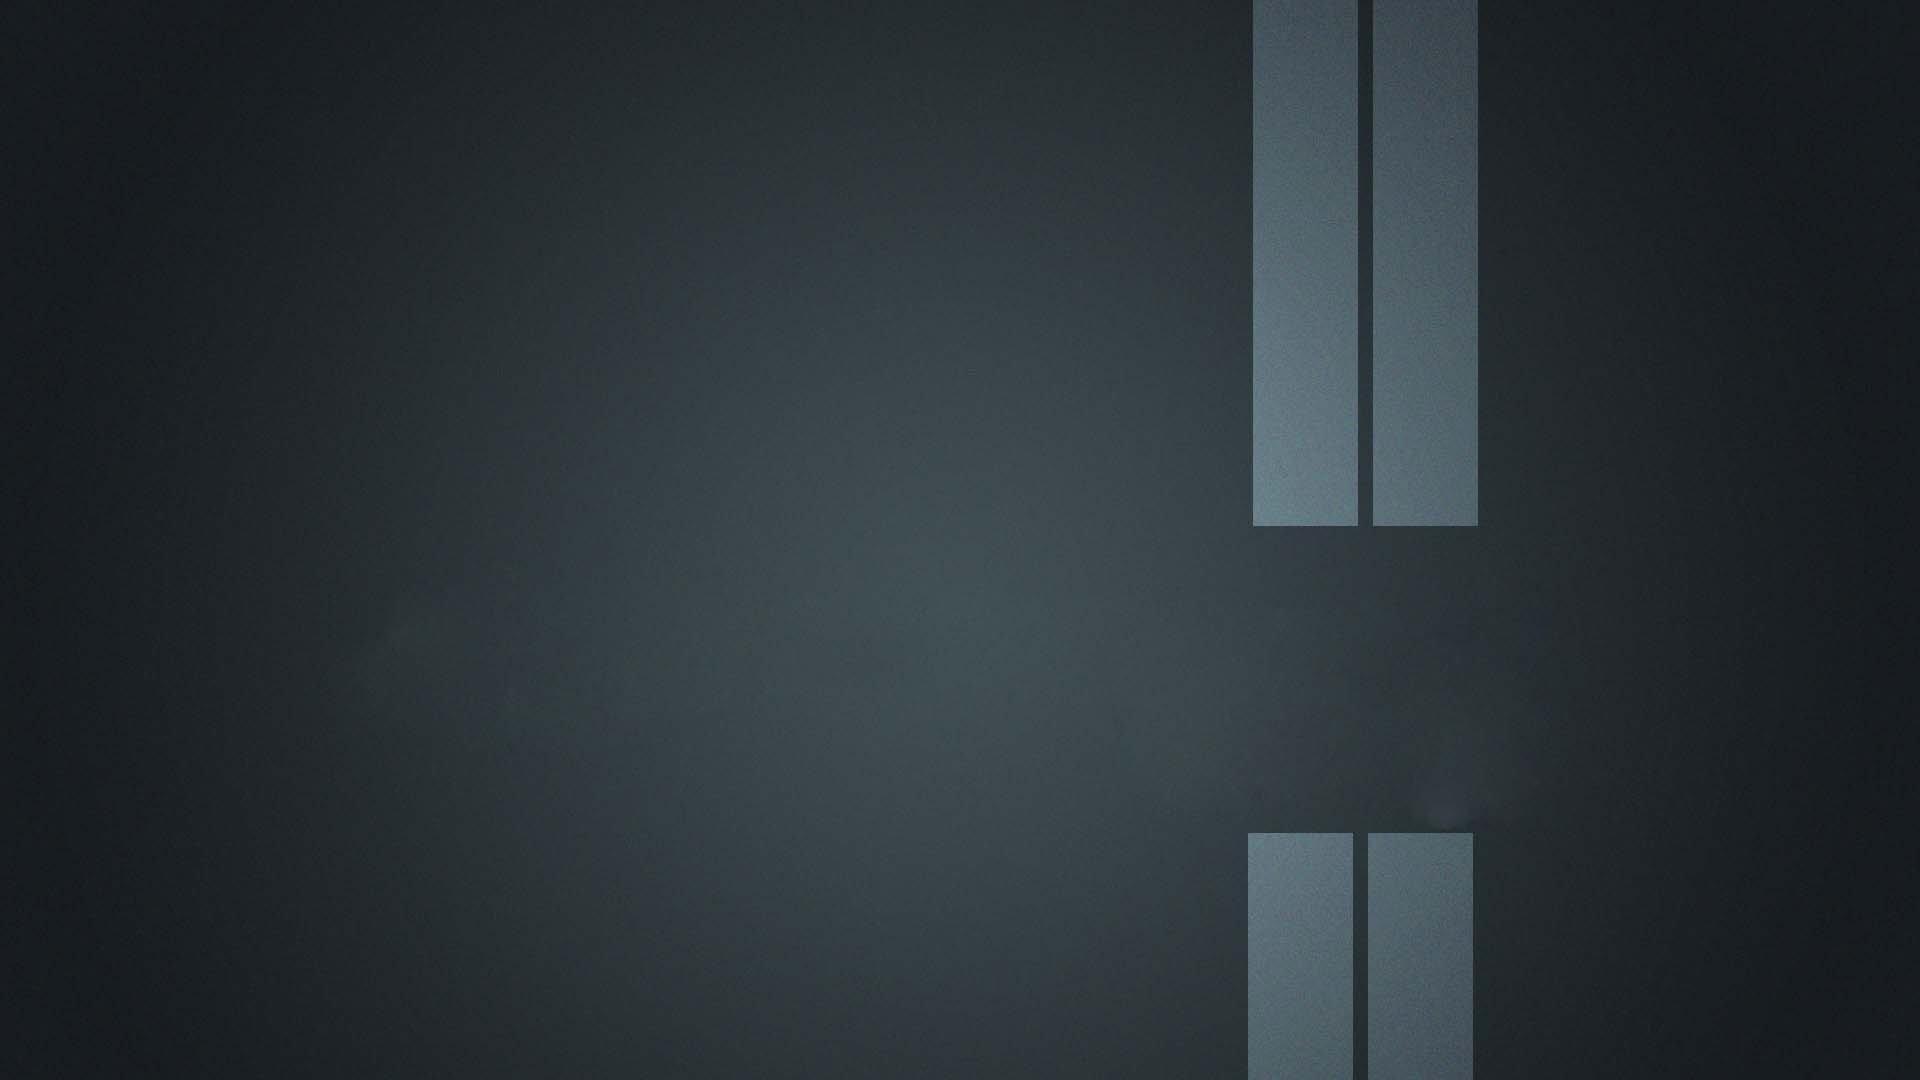 wallpaper.wiki-Background-plain-wallpaper-damask-wallpapers-desktop-